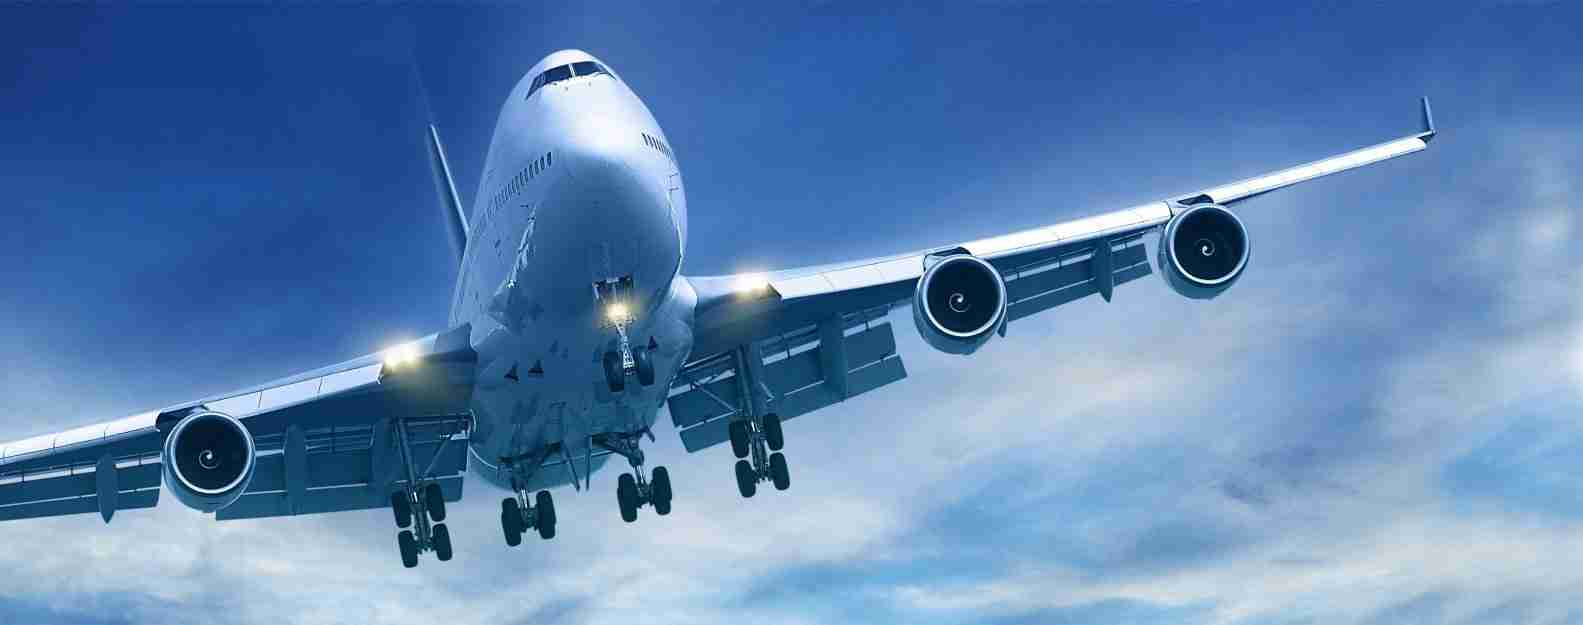 Авиаперевозки в Няндому